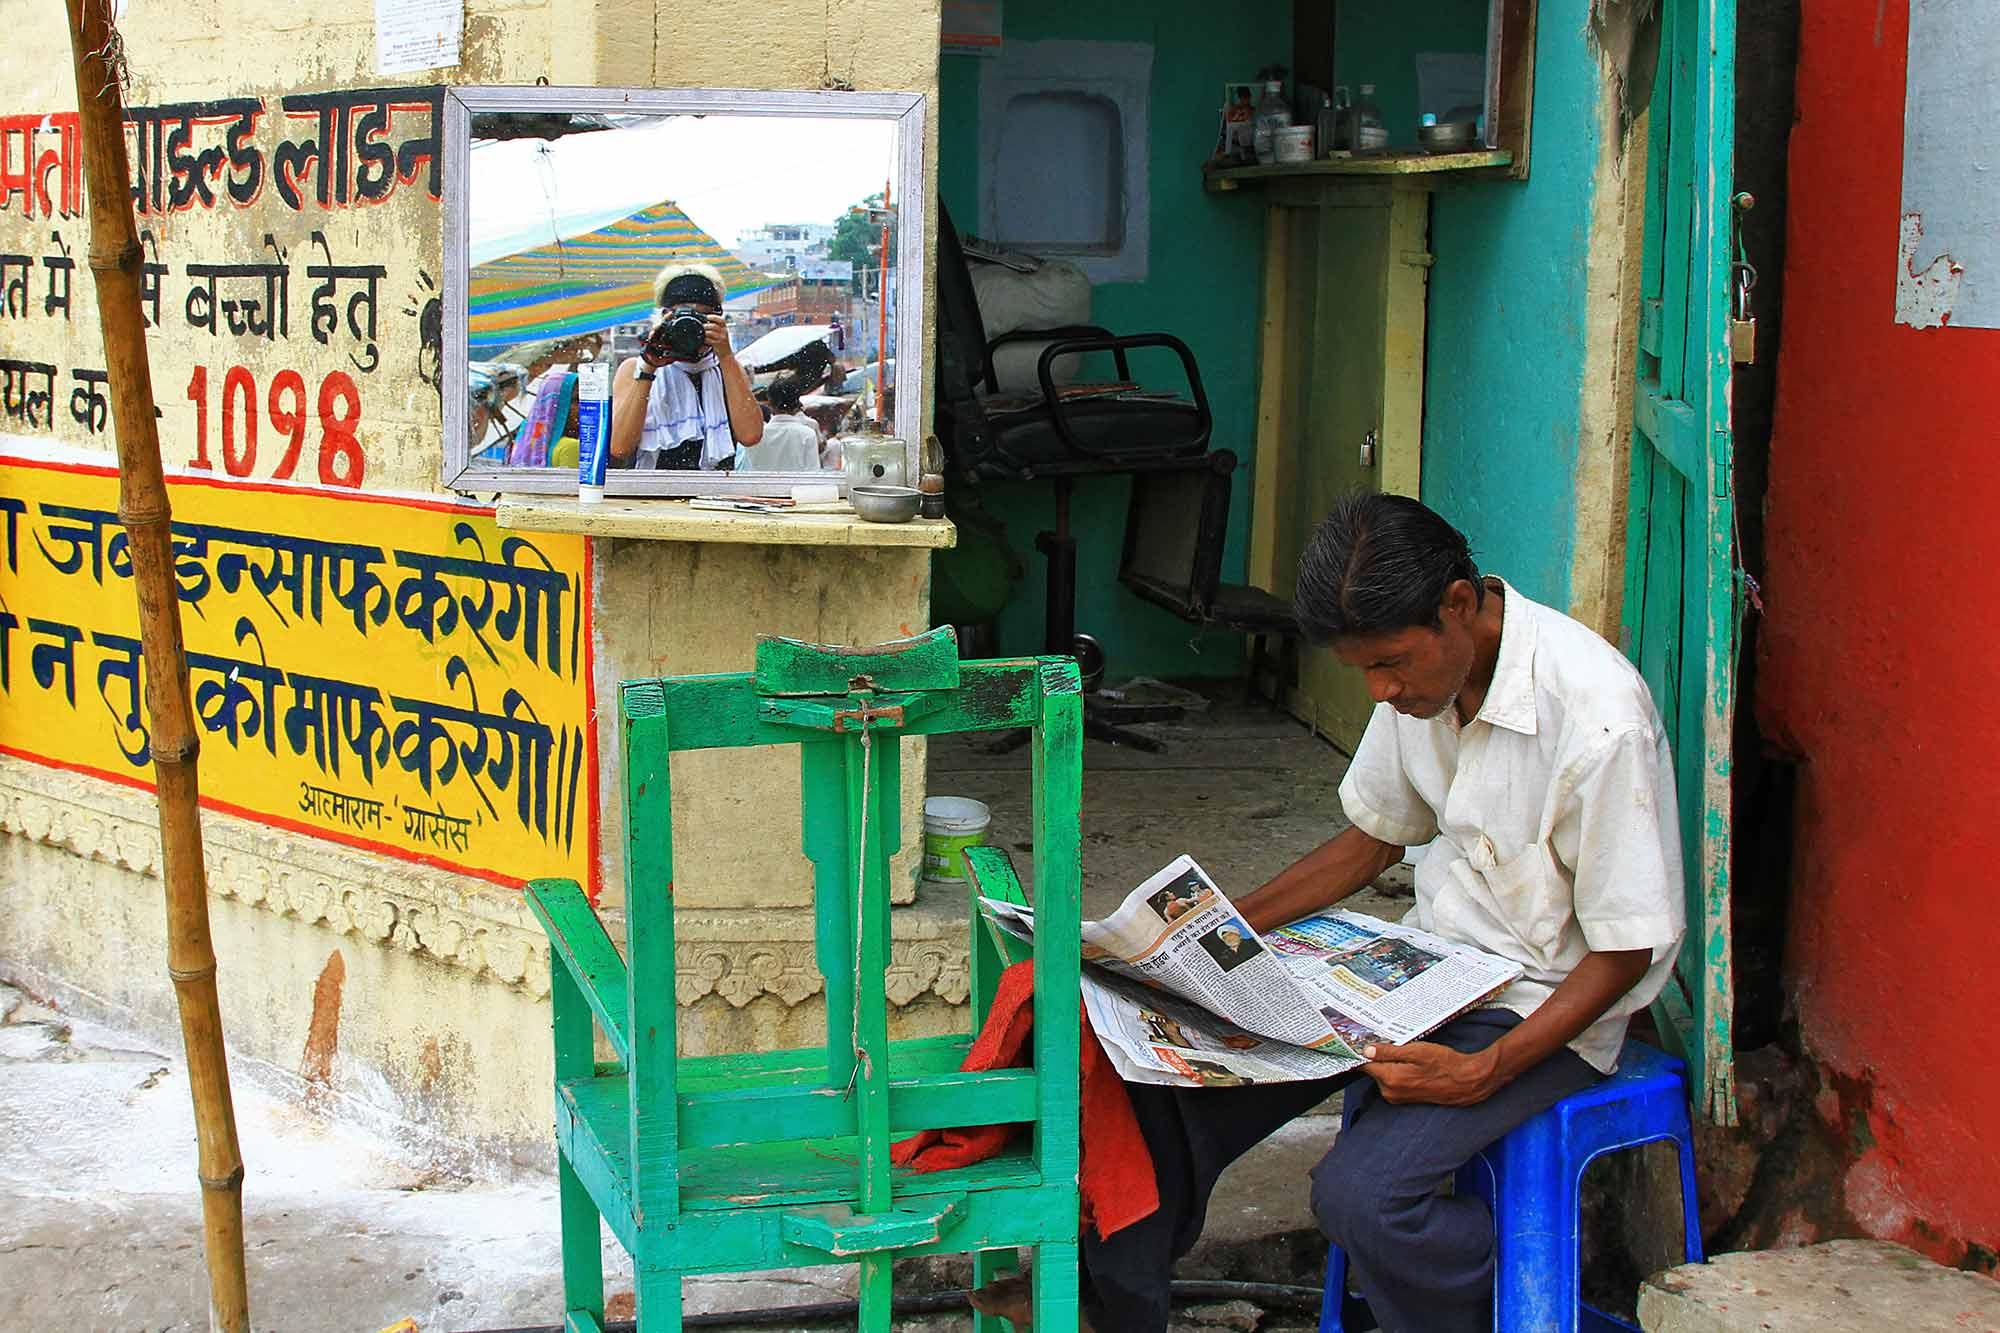 barber-shop-street-varanasi-india